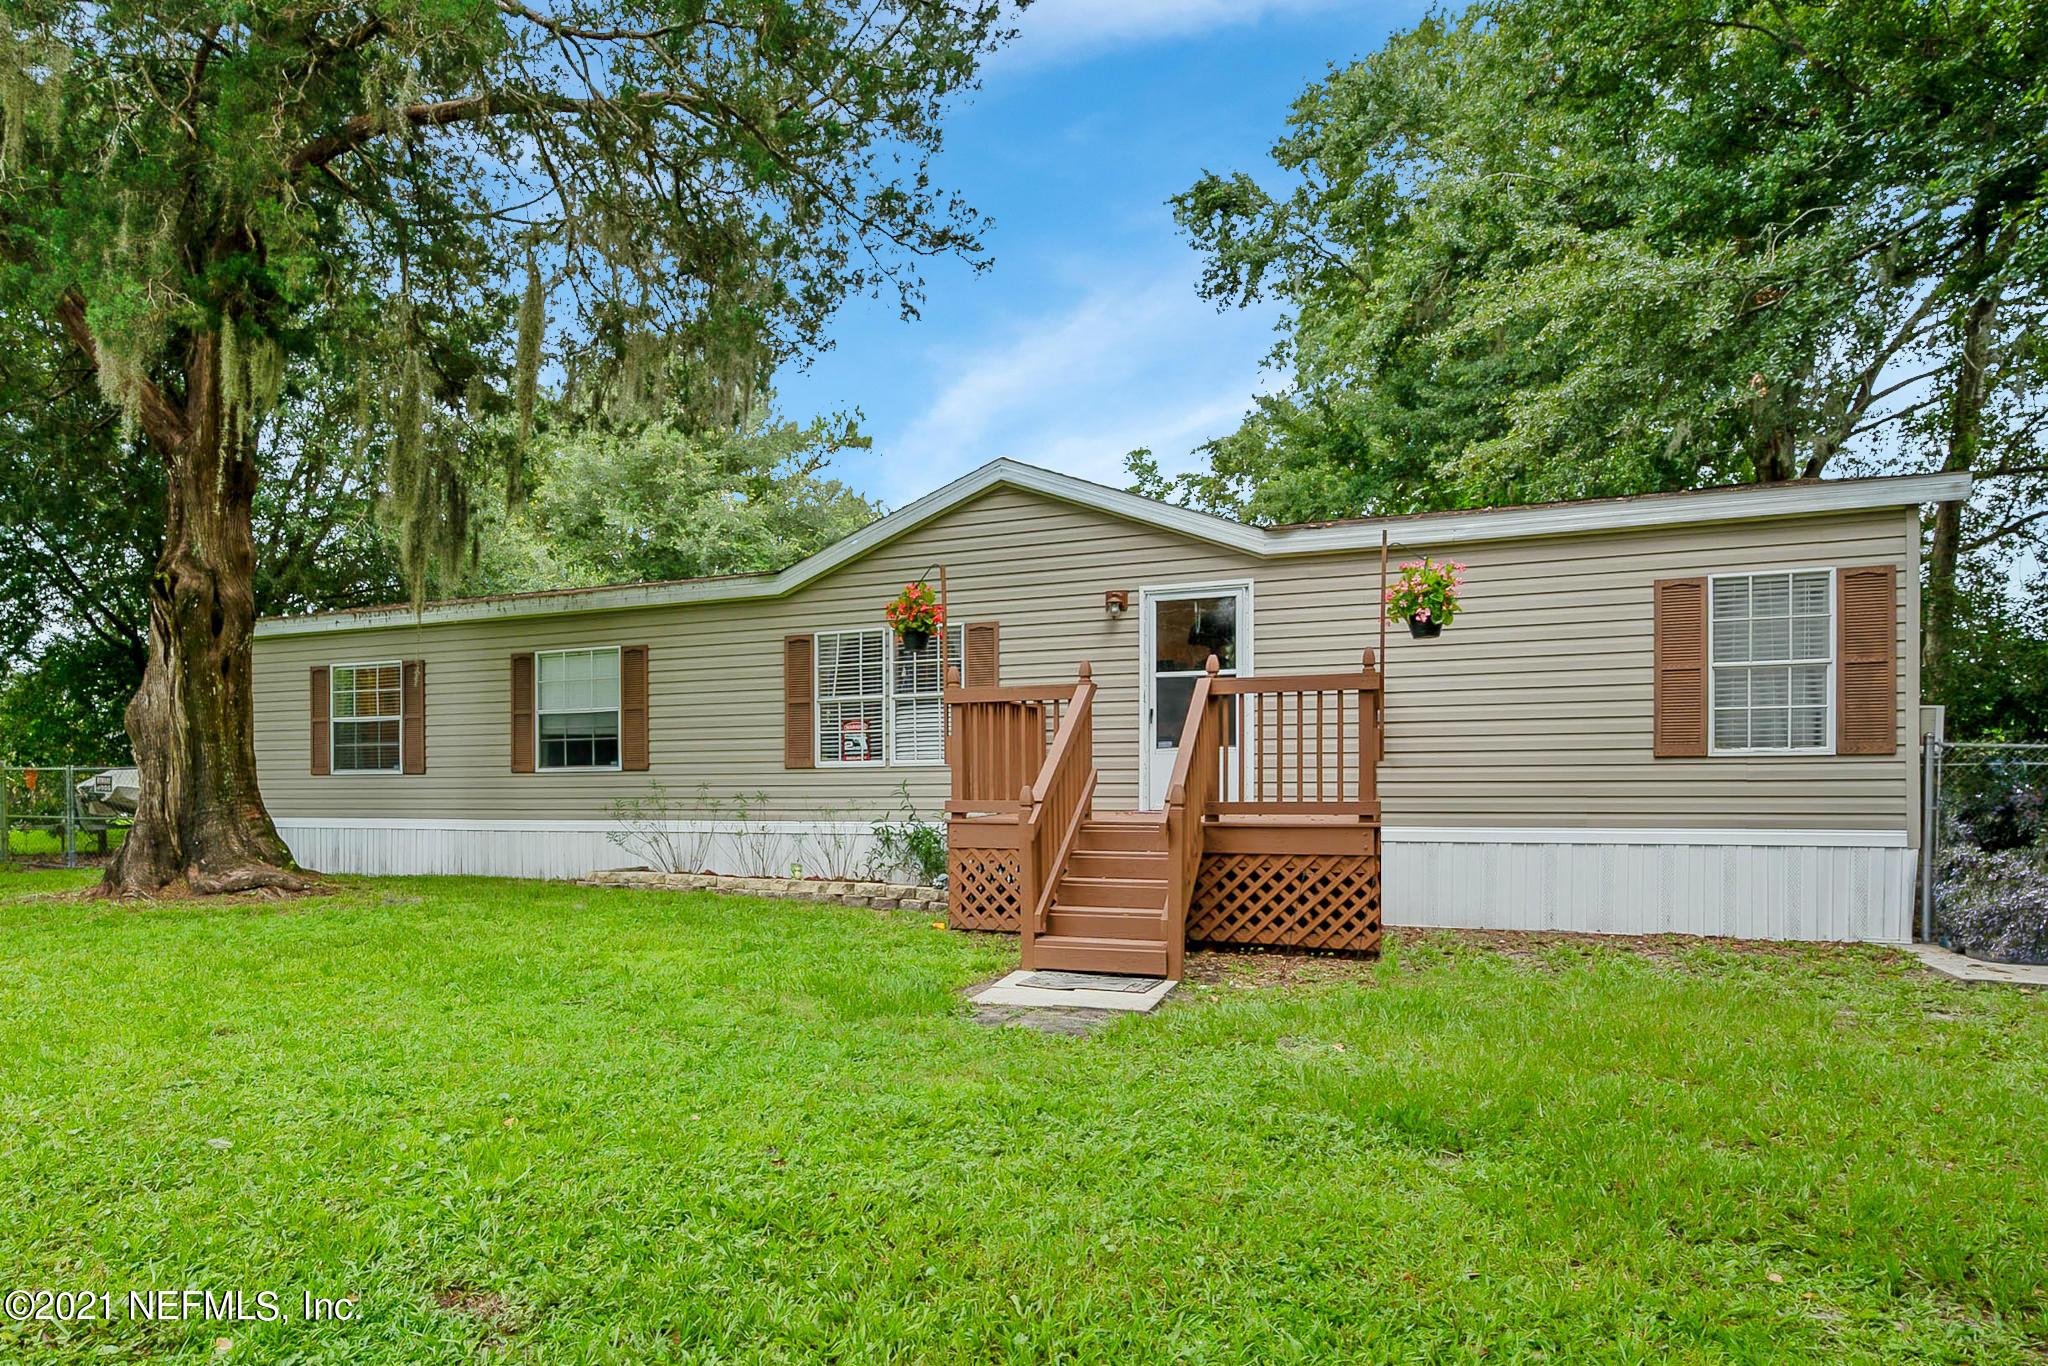 75746 JOHNSON LAKE, YULEE, FLORIDA 32097, 4 Bedrooms Bedrooms, ,2 BathroomsBathrooms,Residential,For sale,JOHNSON LAKE,1121834